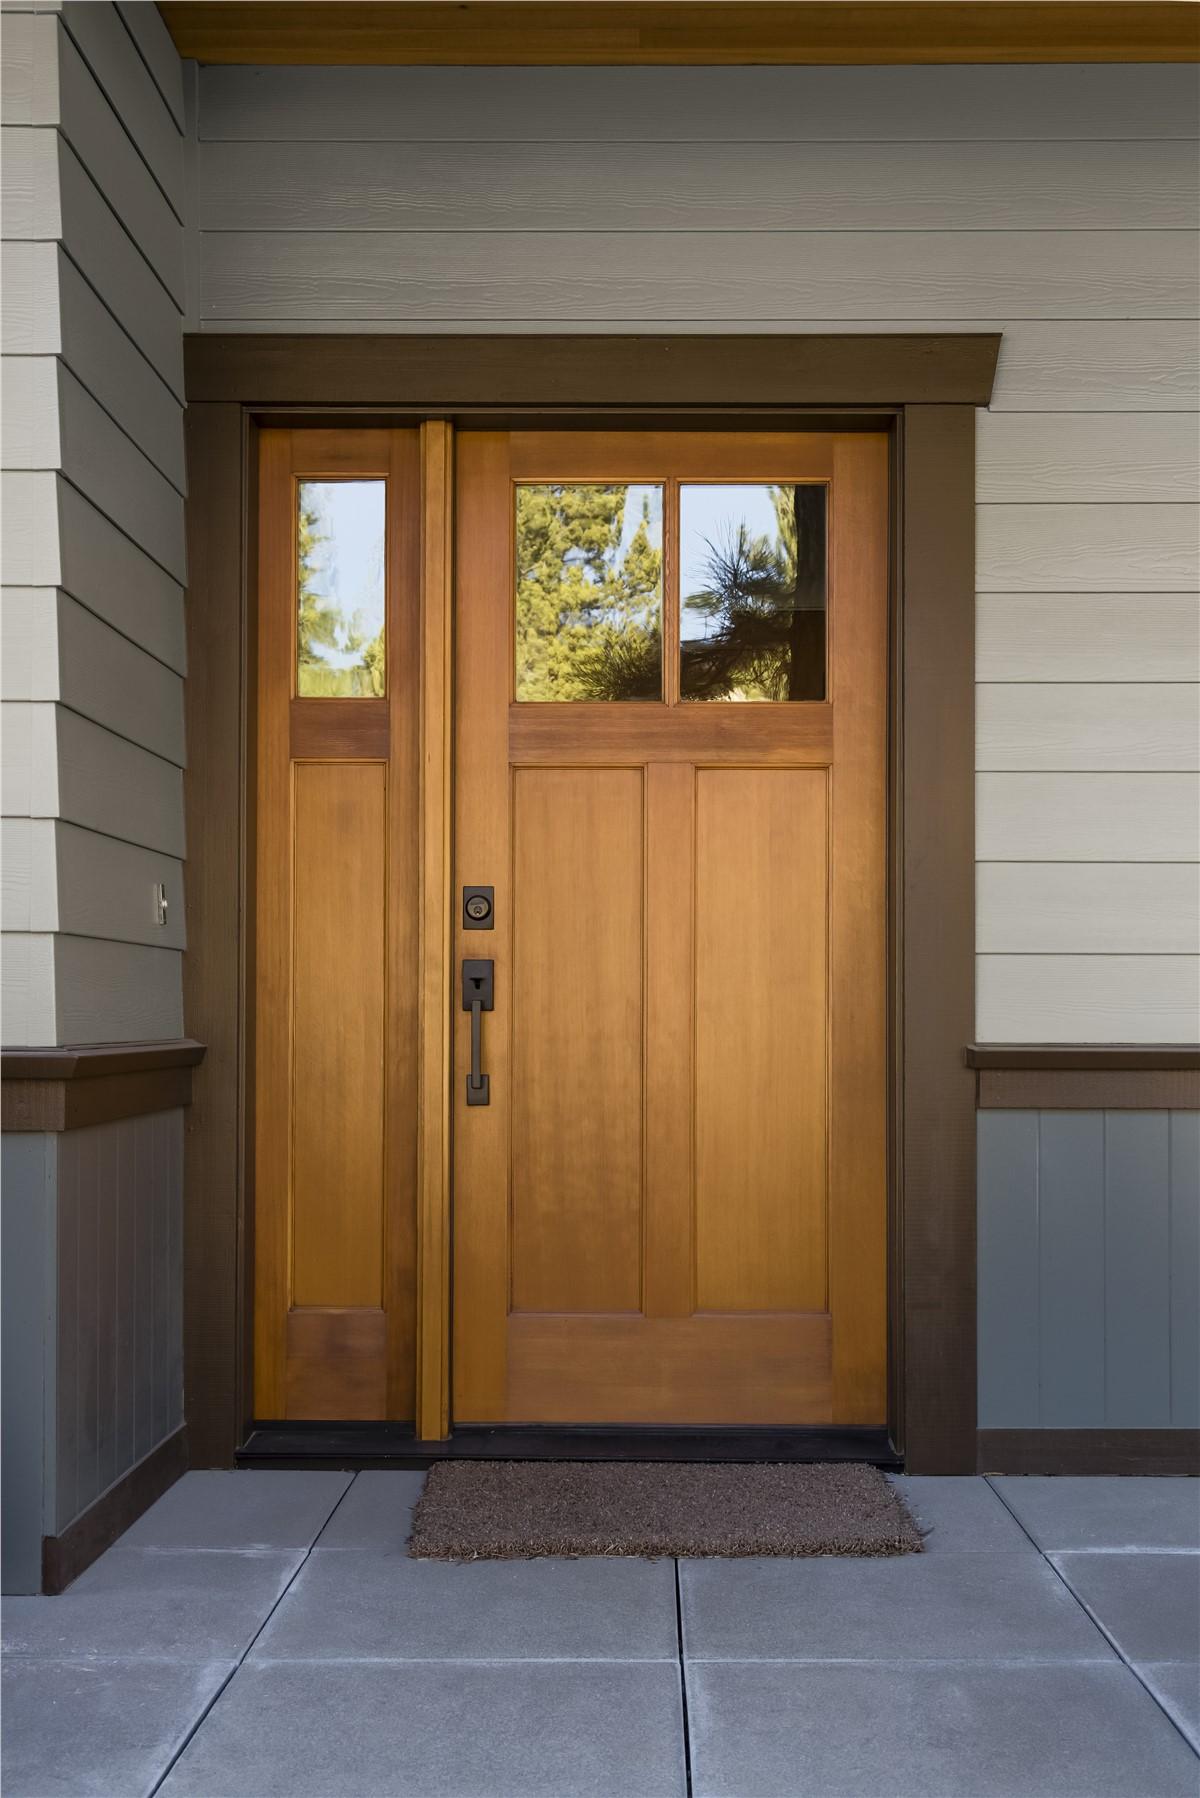 Fibergl Entry Doors 2